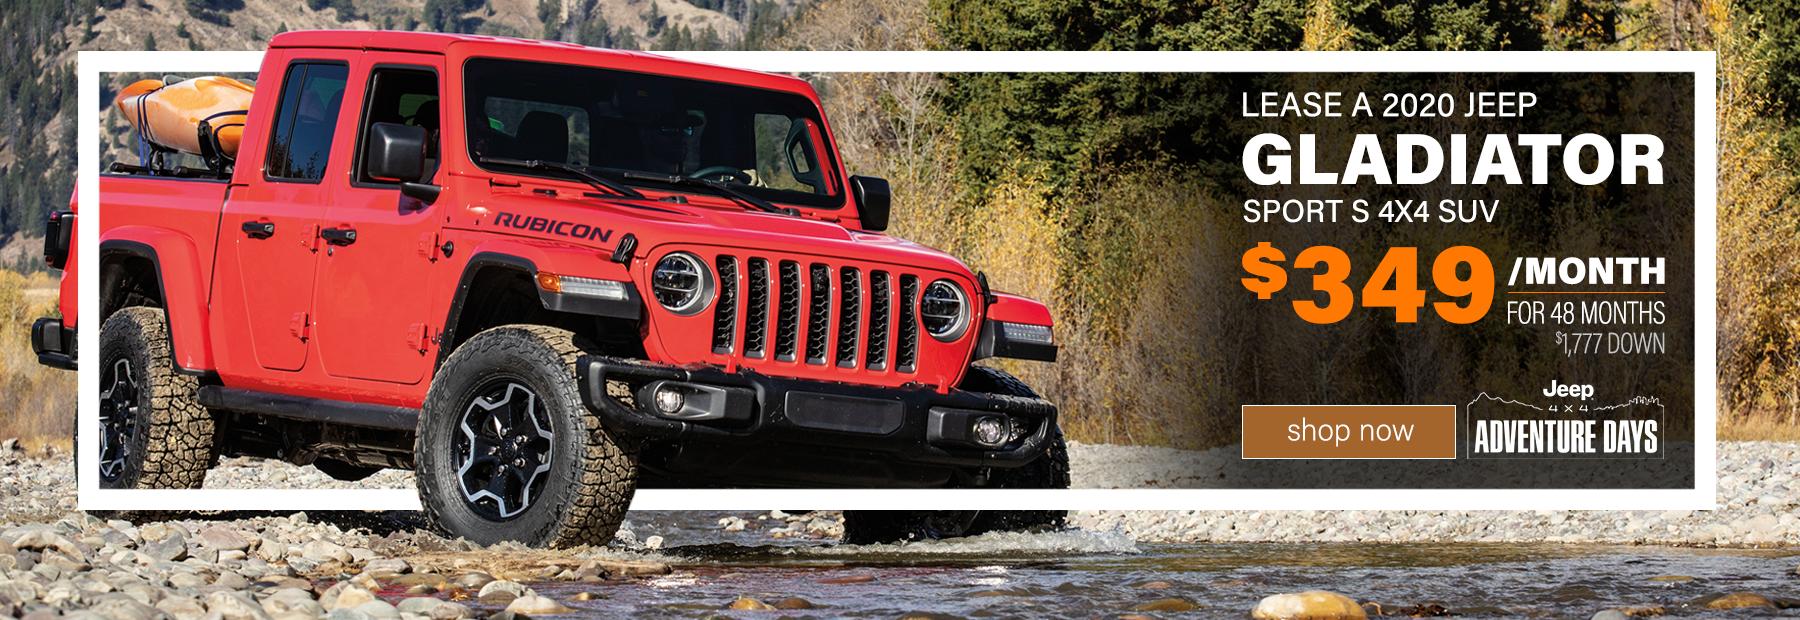 new-2020-jeep-gladiator-lease-deal-dayton-ohio